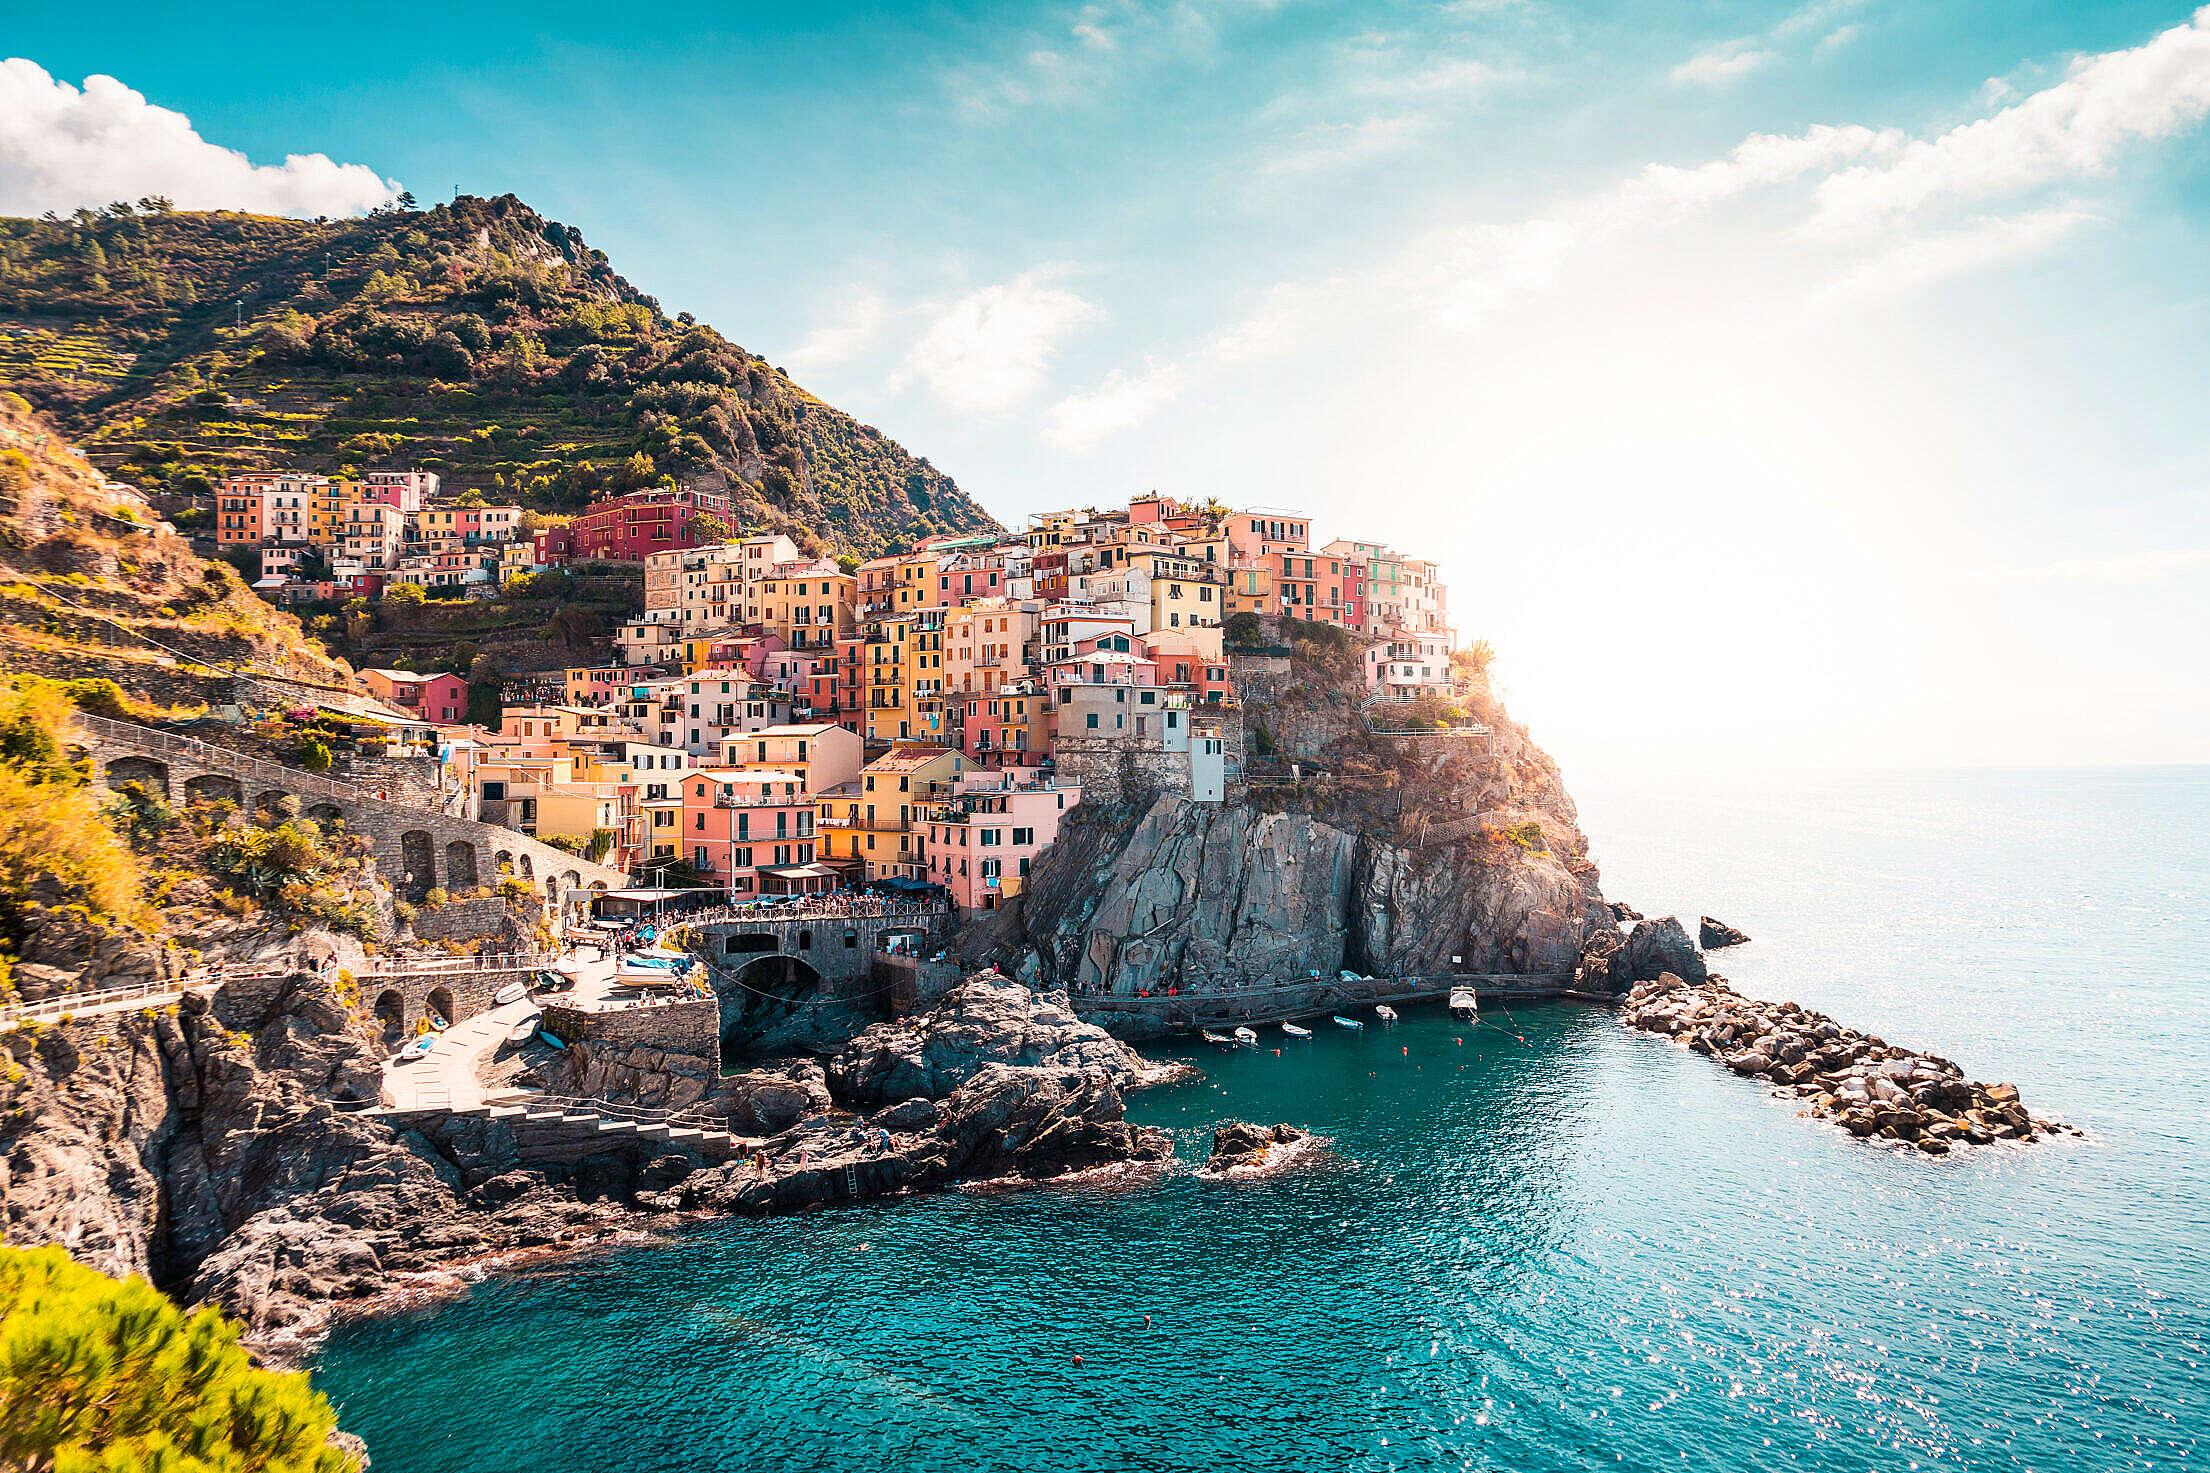 Manarola, La Spezia, Italy Free Stock Photo